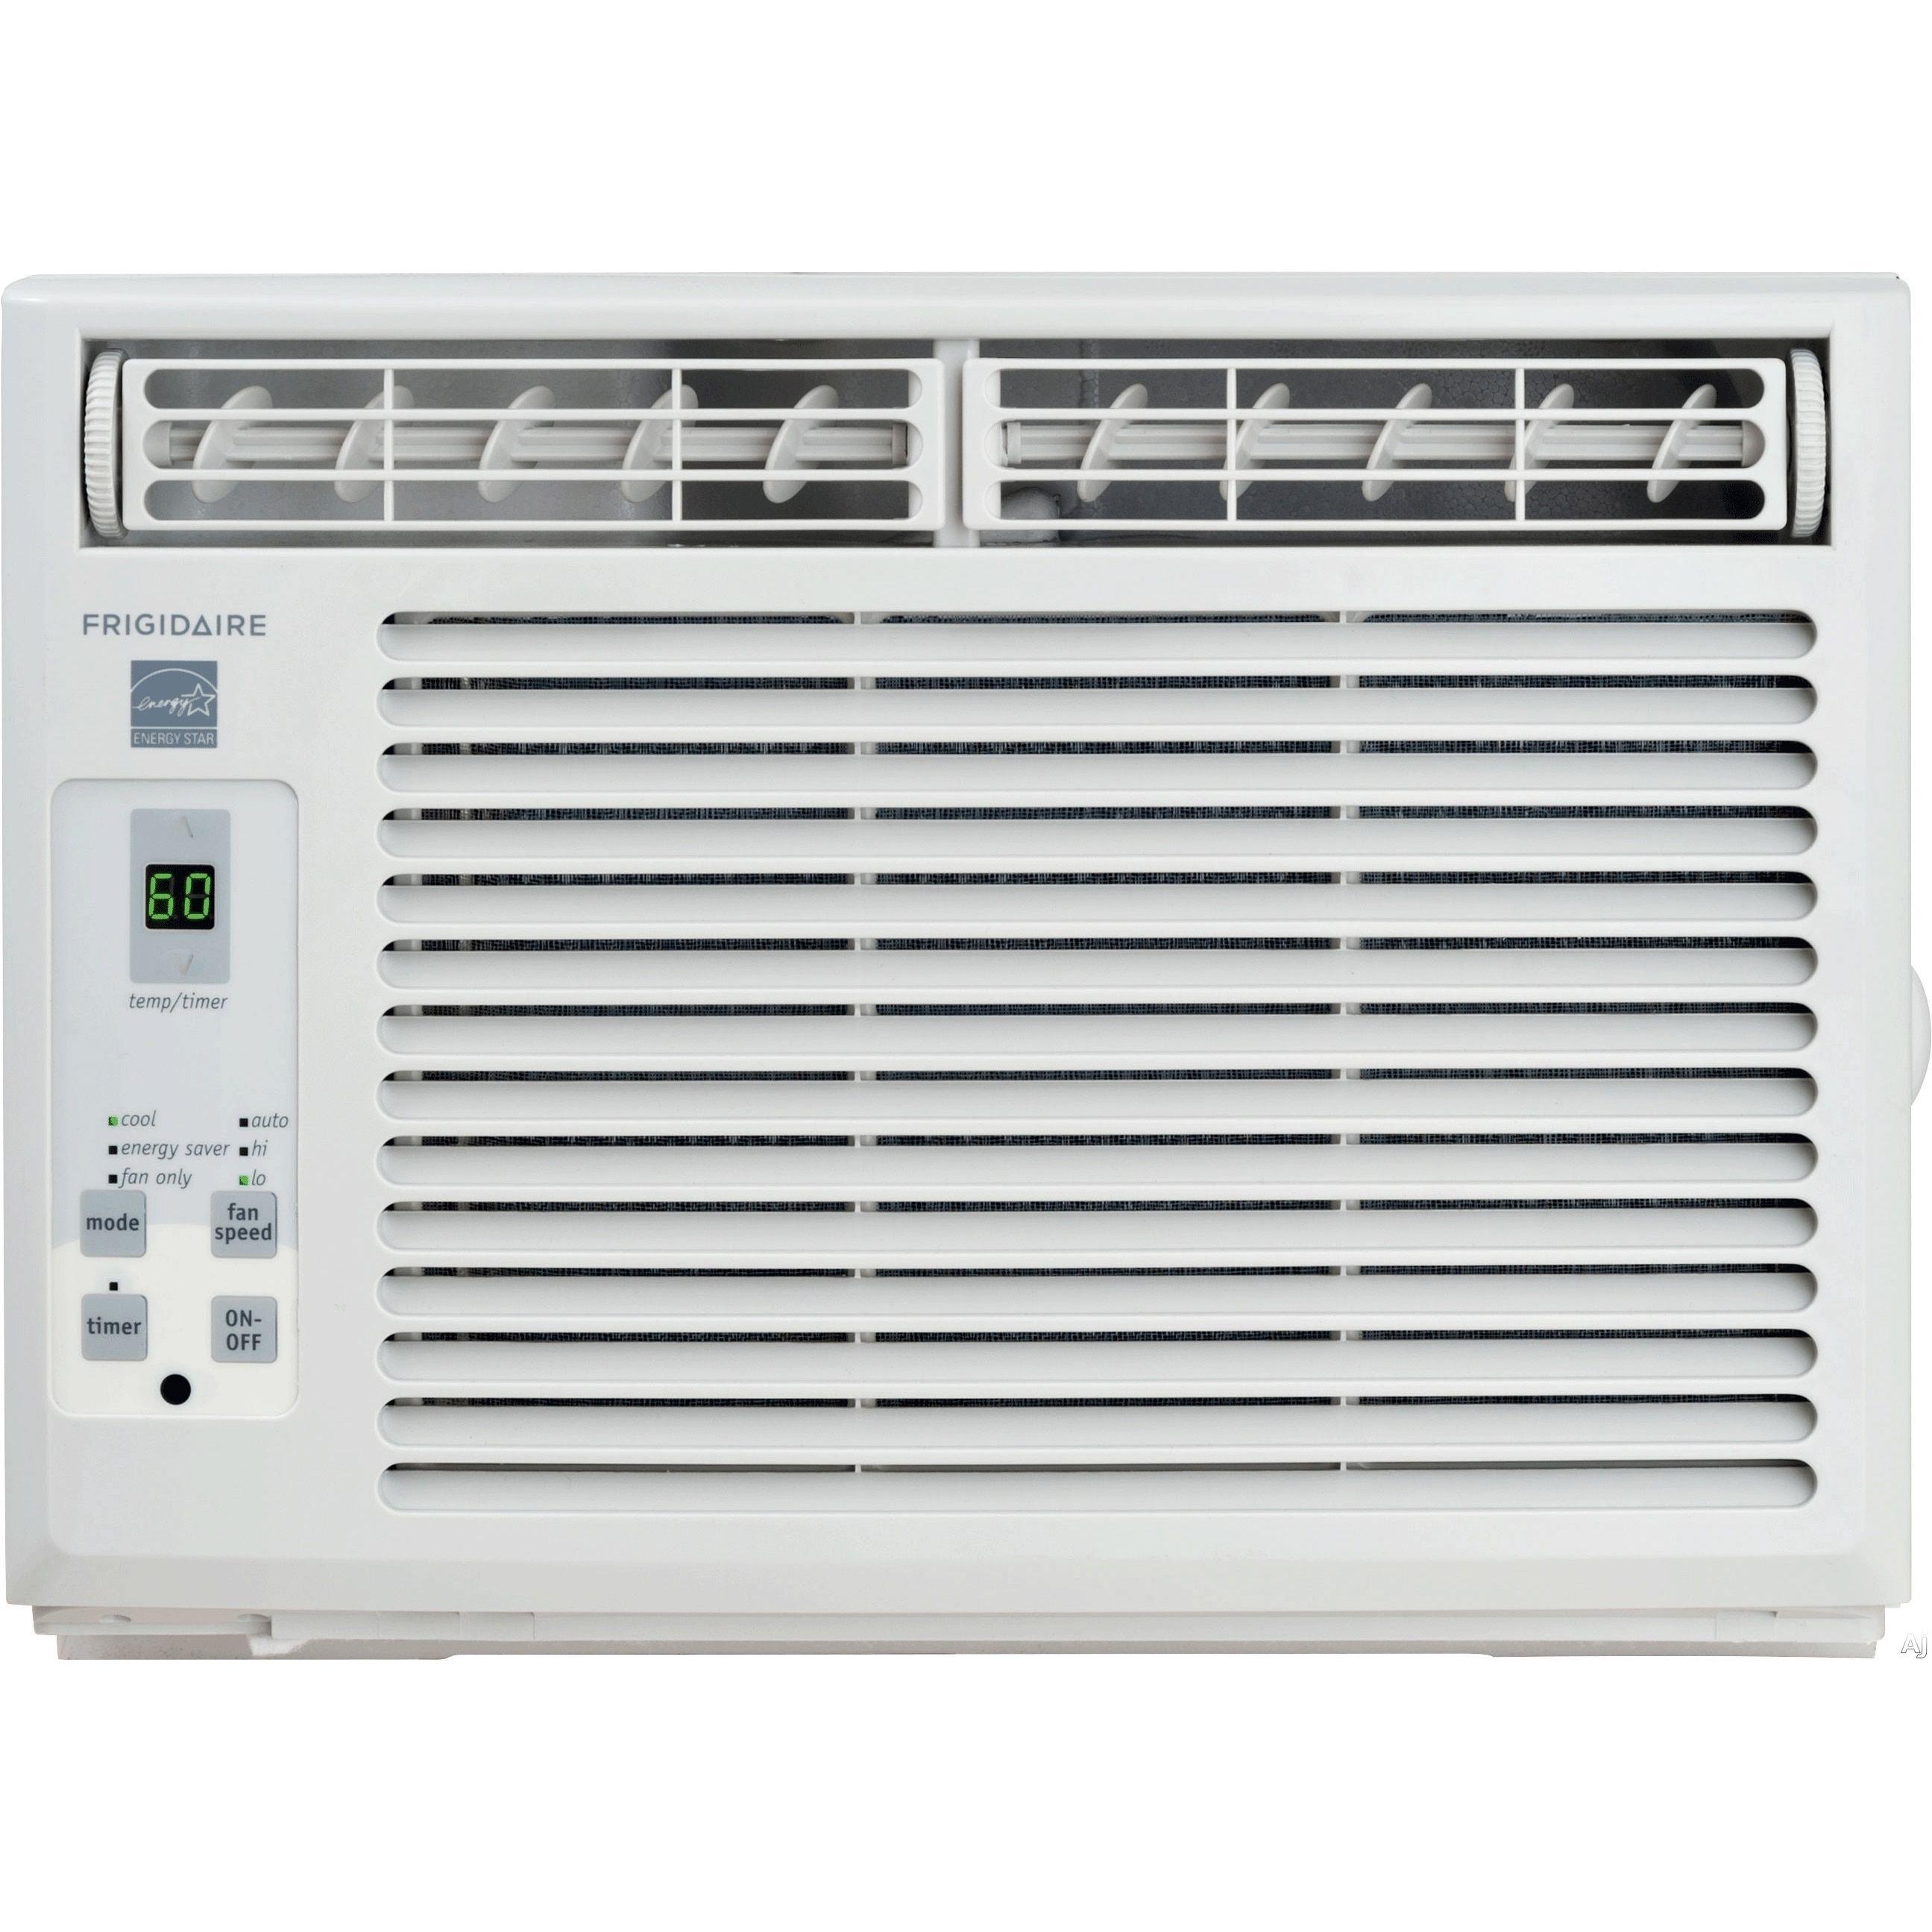 Frigidaire 5000 BTU Window Air Conditioner  sc 1 st  Pinterest & Frigidaire 5000 BTU Window Air Conditioner (Metal) | Window air ...